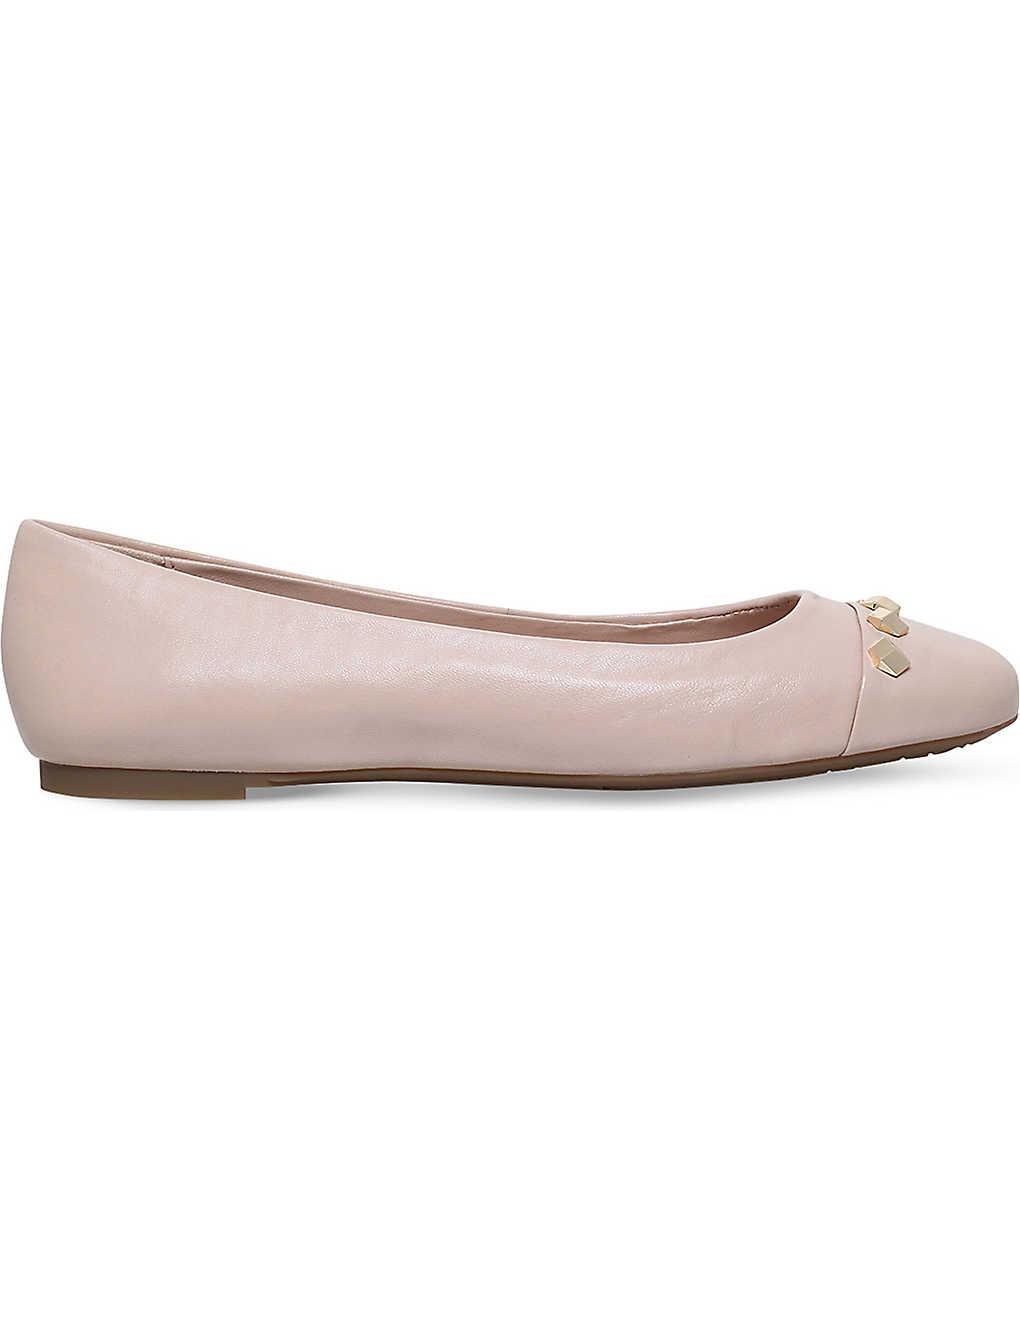 d1a023d6f MICHAEL MICHAEL KORS - Valencia leather ballerina shoes | Selfridges.com